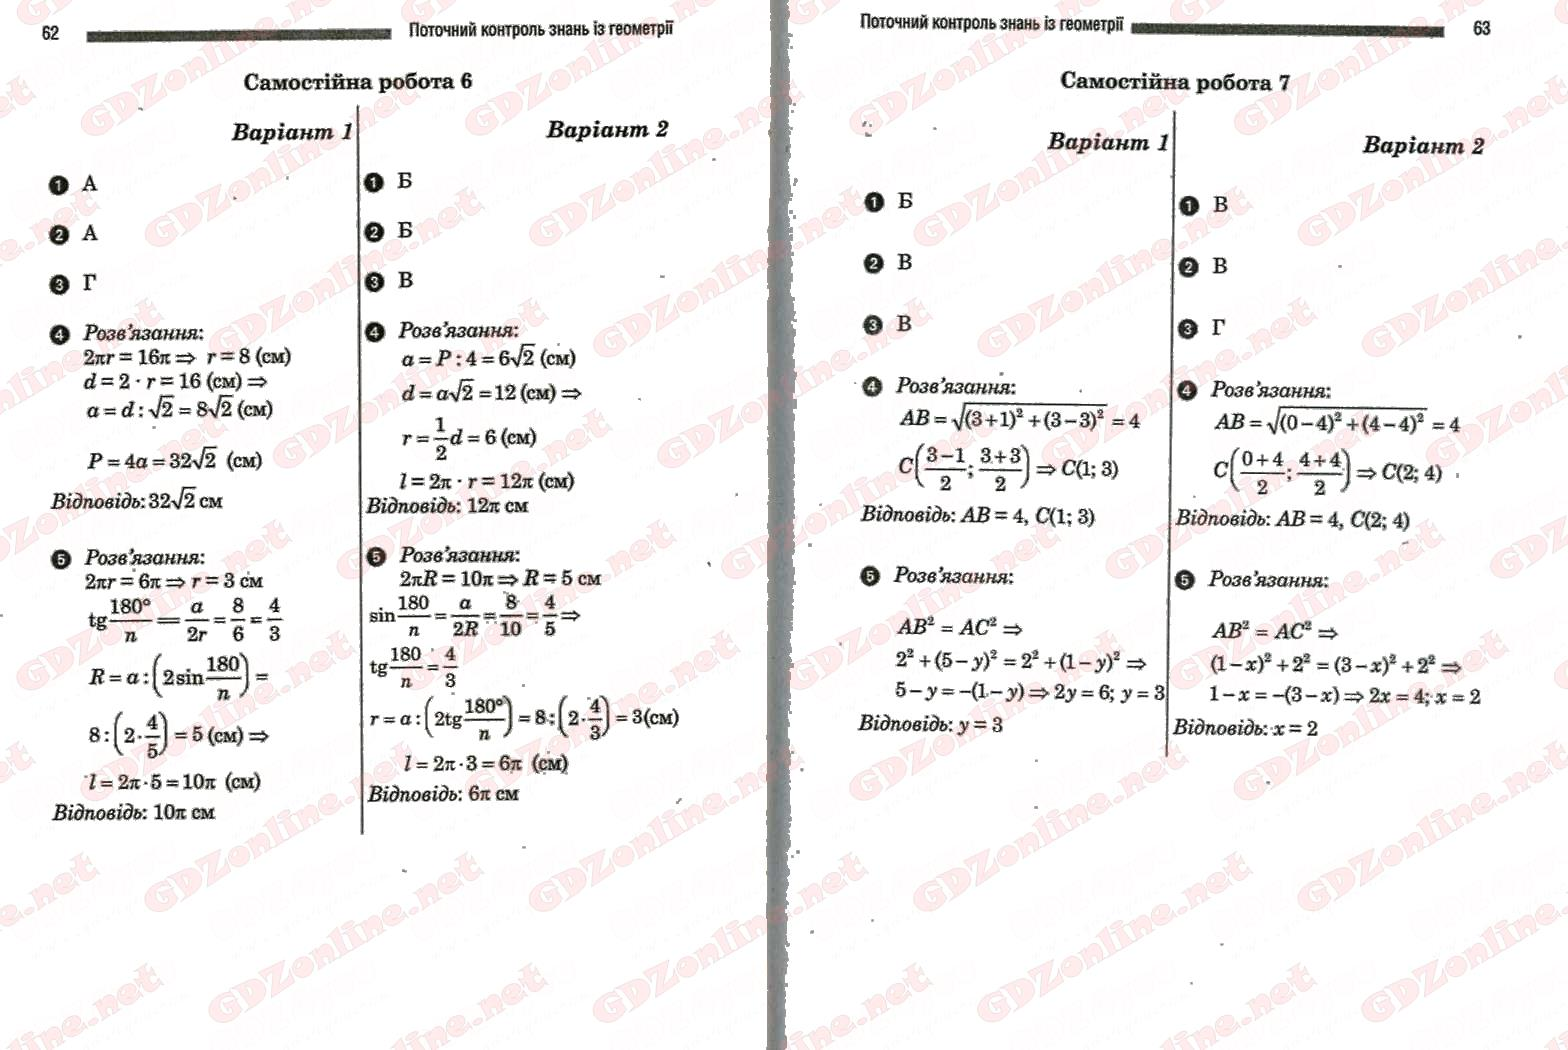 Комплексний зошит для контролю знань 9 класс фізика скачать